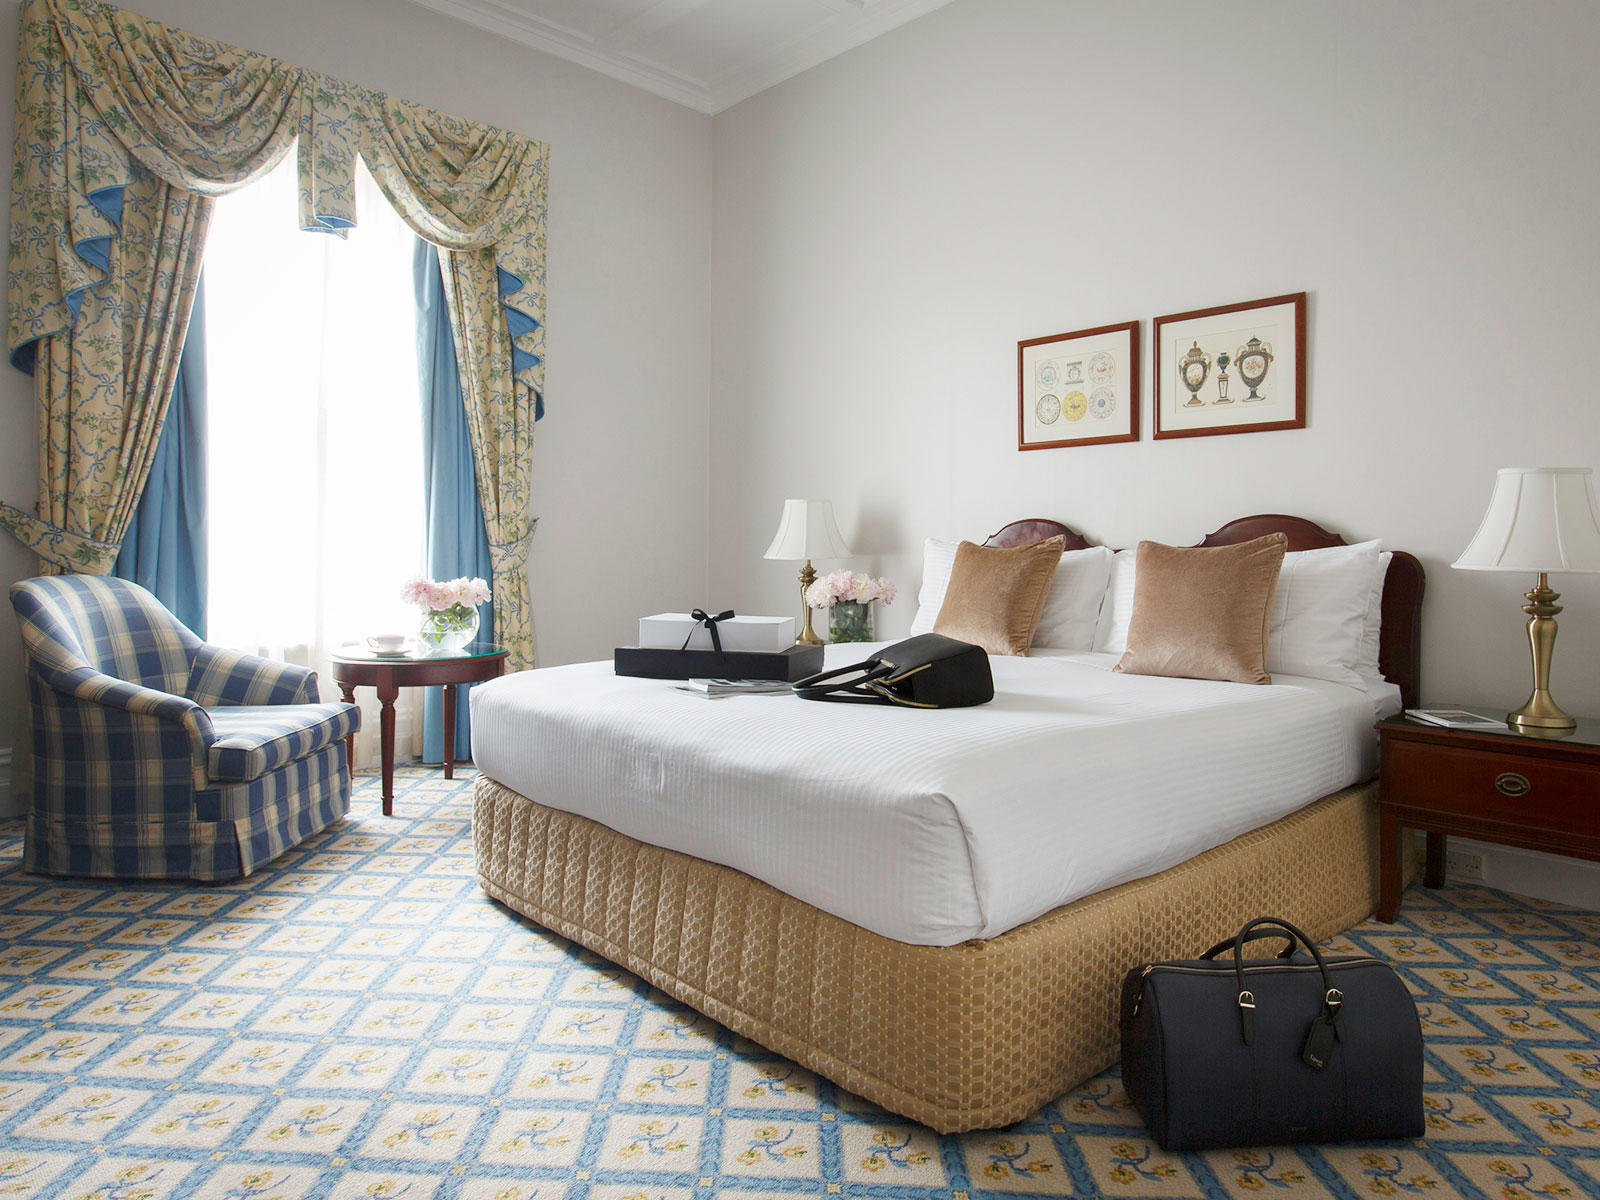 Superior Room at The Hotel Windsor Melbourne